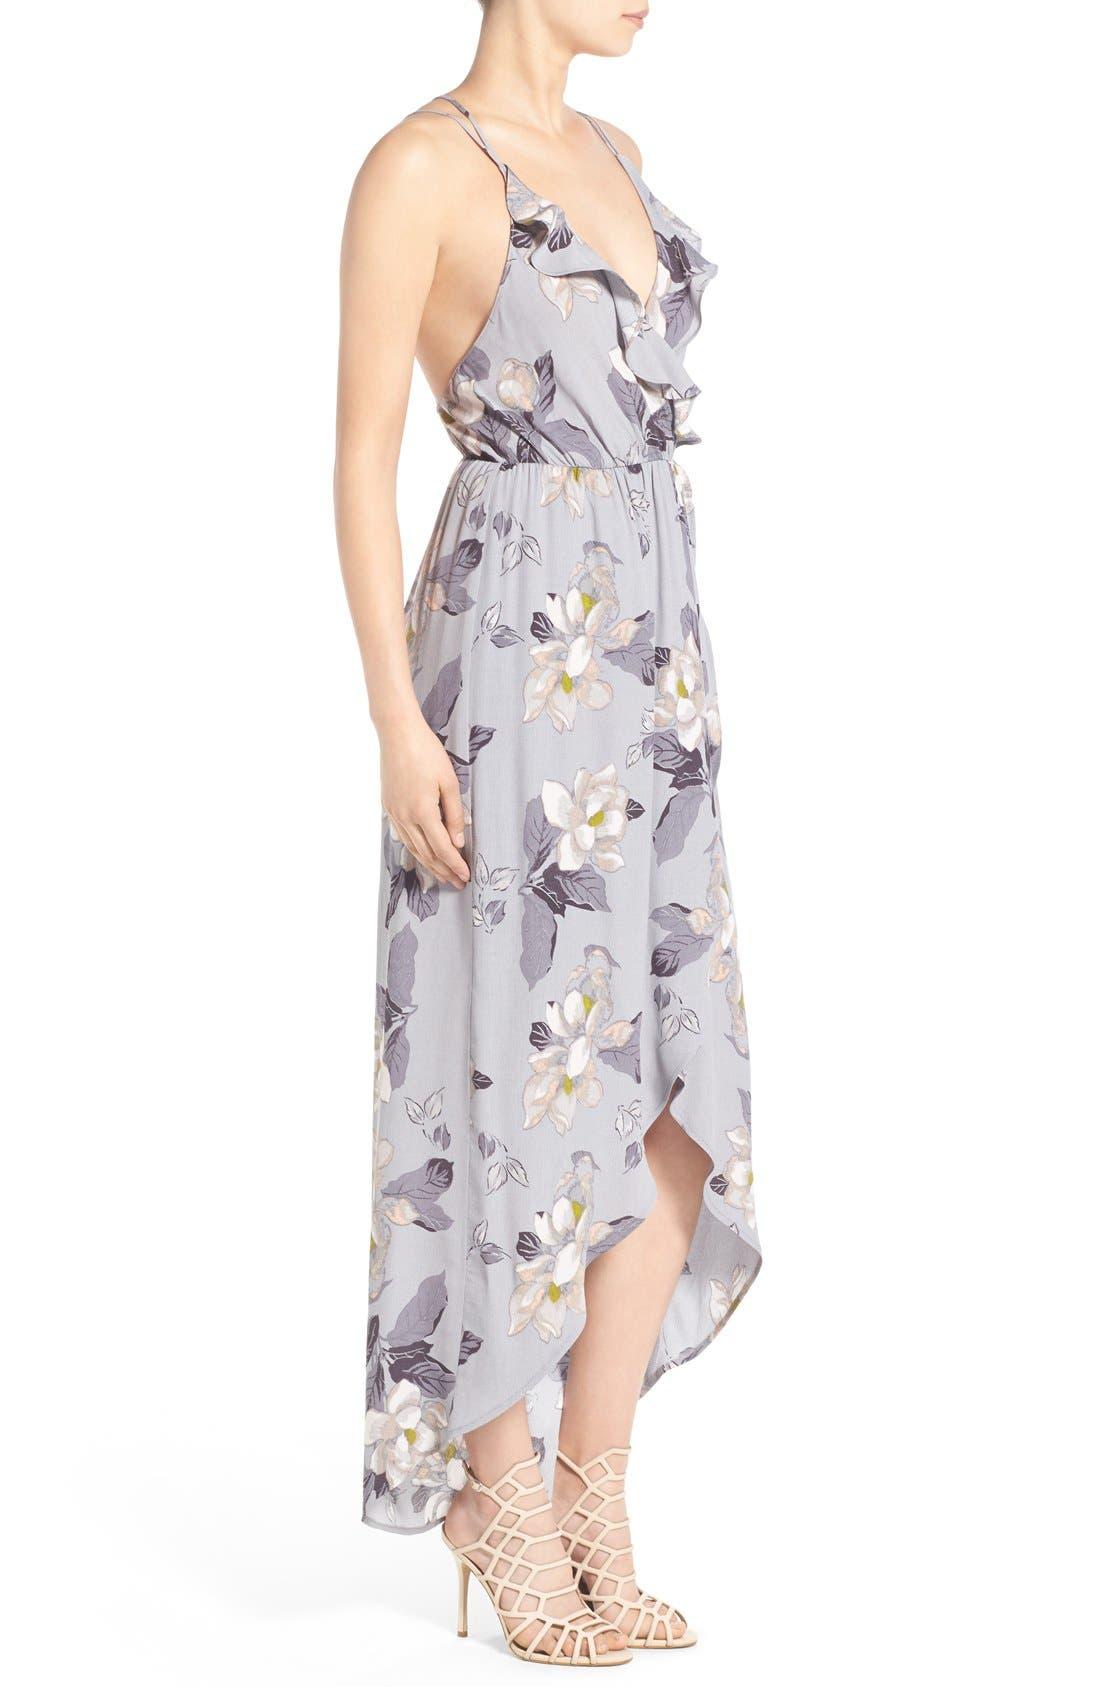 ASTR Ruffle Surplice High/Low Maxi Dress,                             Alternate thumbnail 3, color,                             Grey Multi Floral